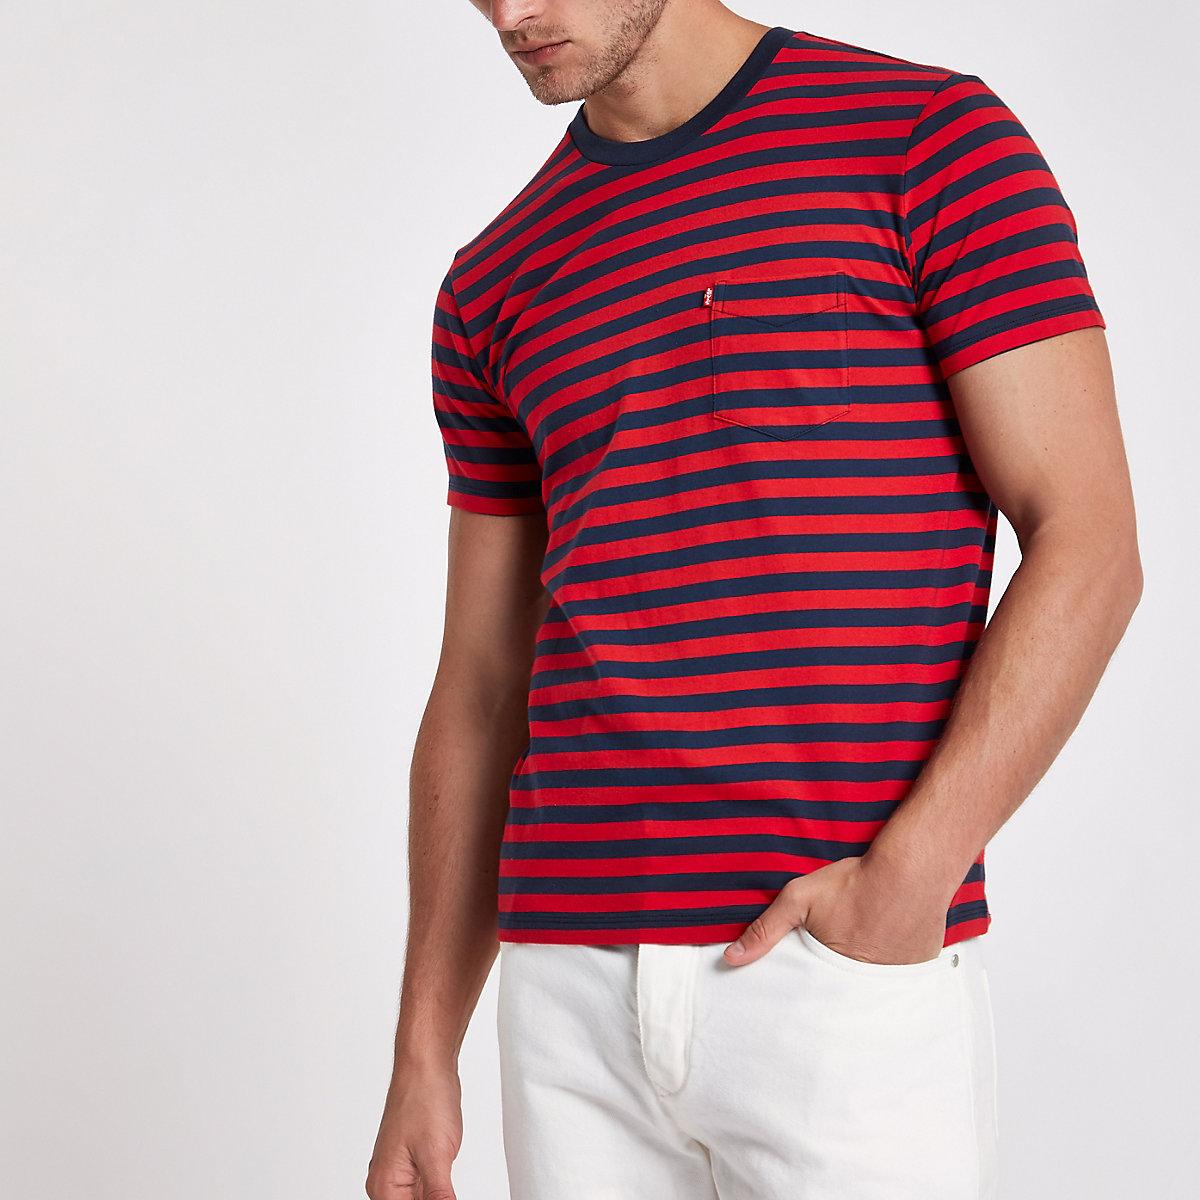 Levi's red stripe short sleeve pocket T-shirt